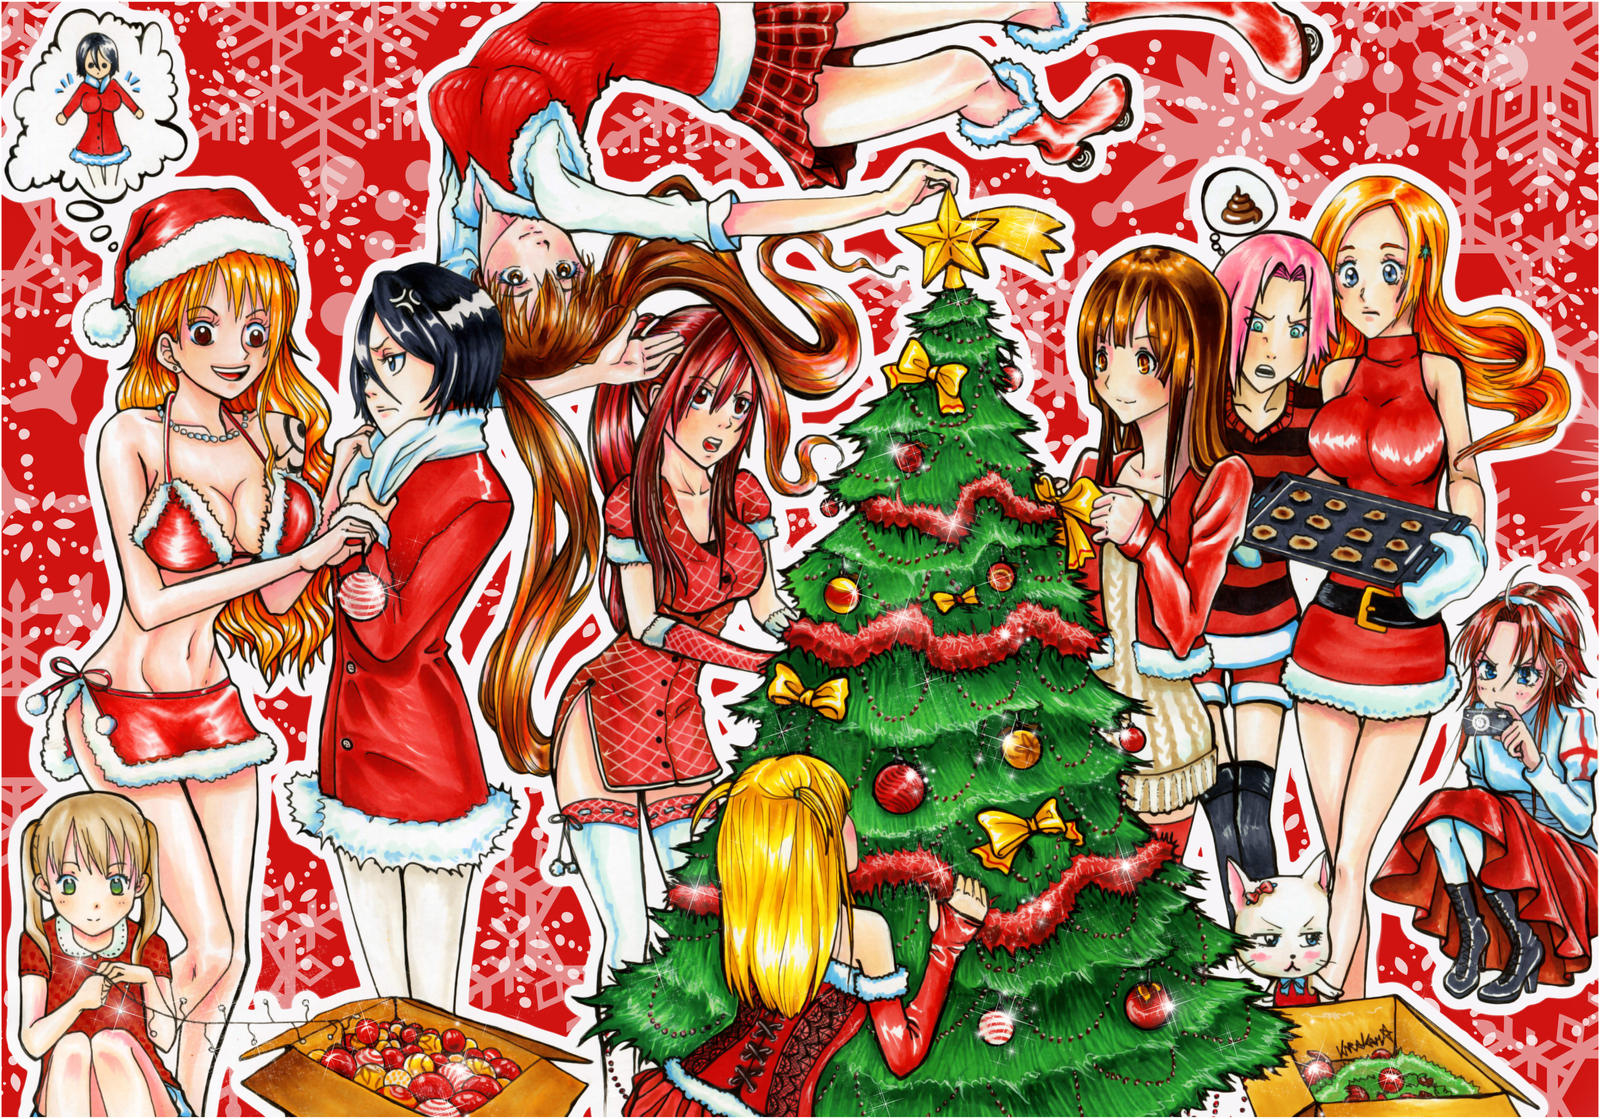 Merry Xmas To All Manga Lovers by kirakam